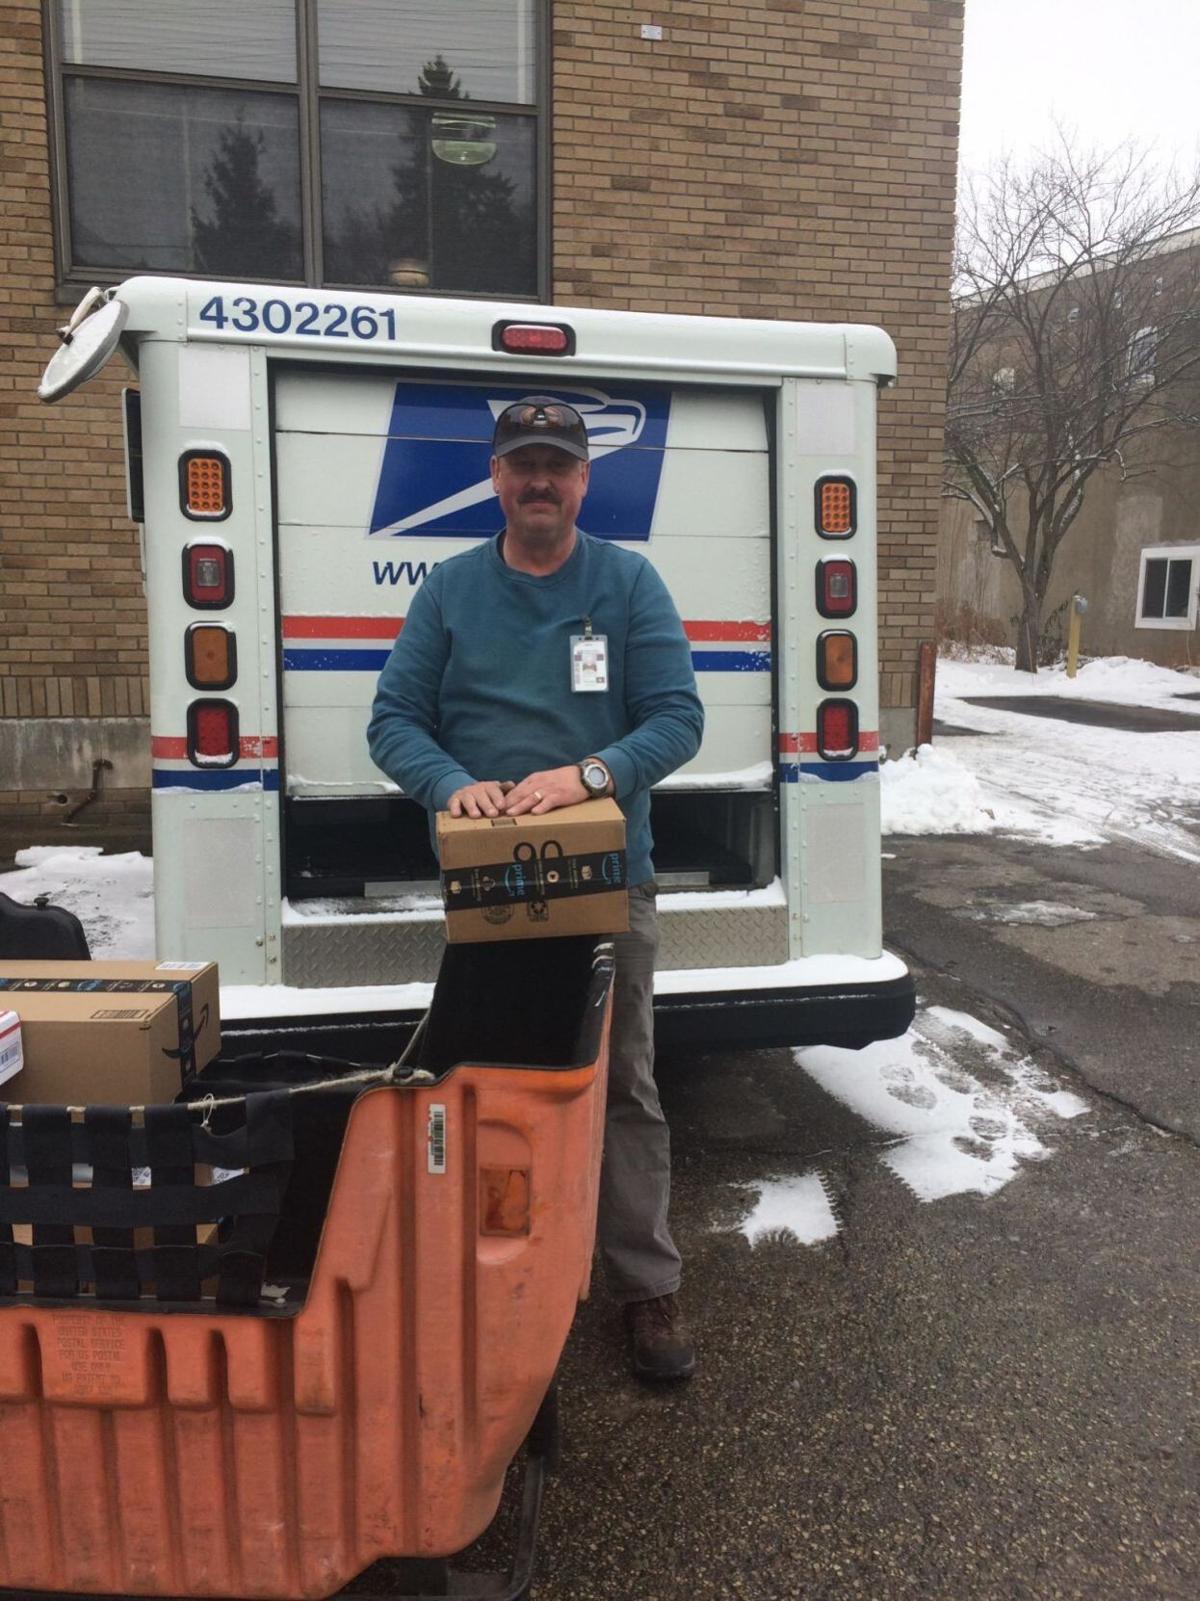 Walworth post office worker Pat Kelly